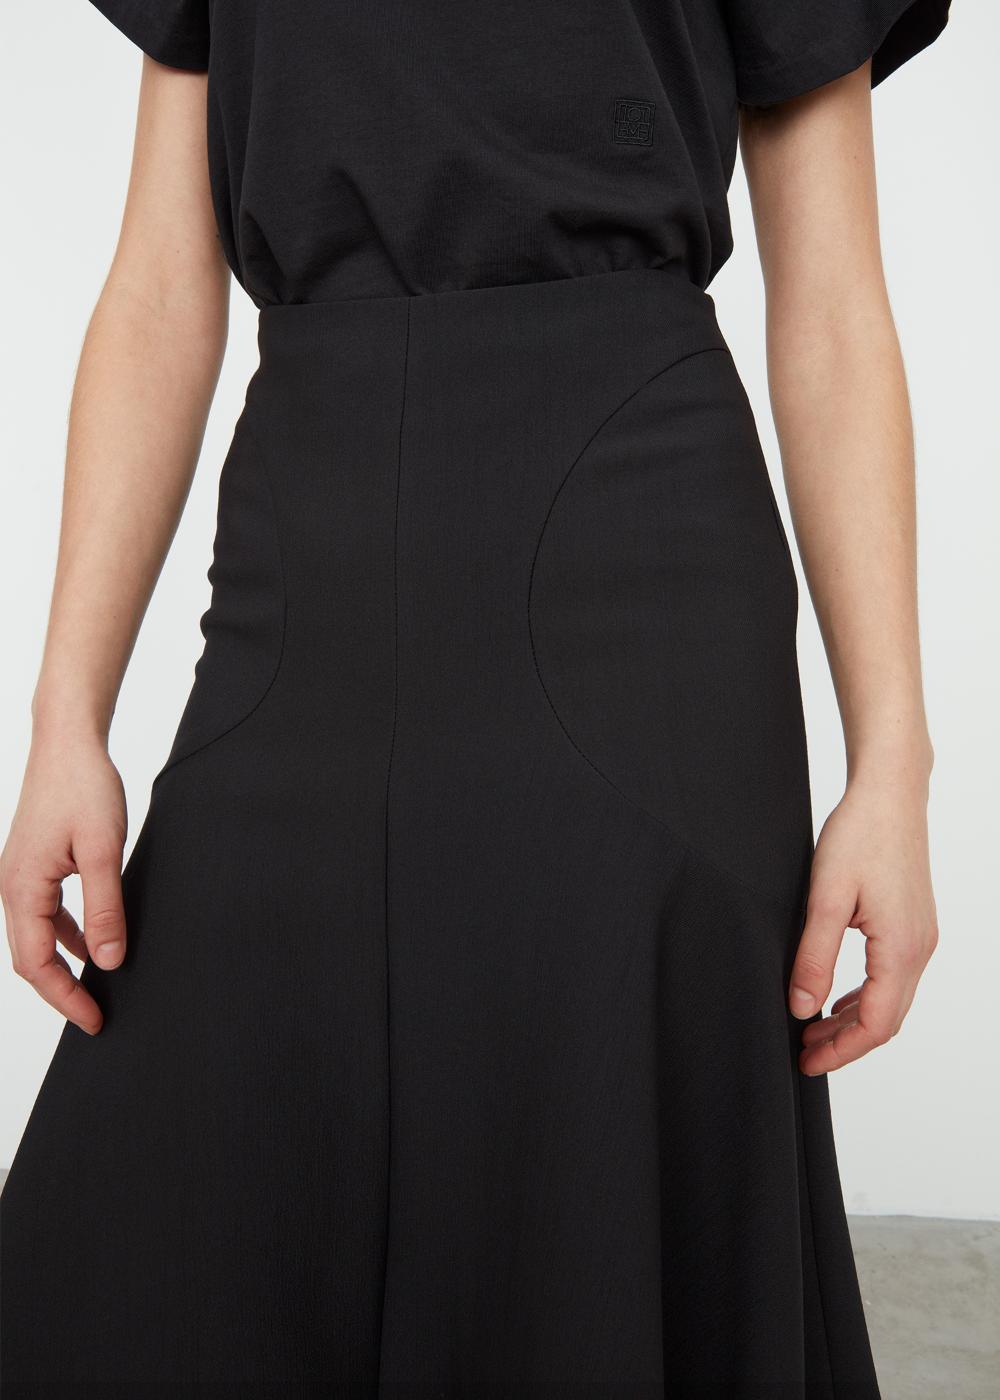 Toteme Dresses Skirts Dress Skirt Dresses Skirts [ 1400 x 1000 Pixel ]